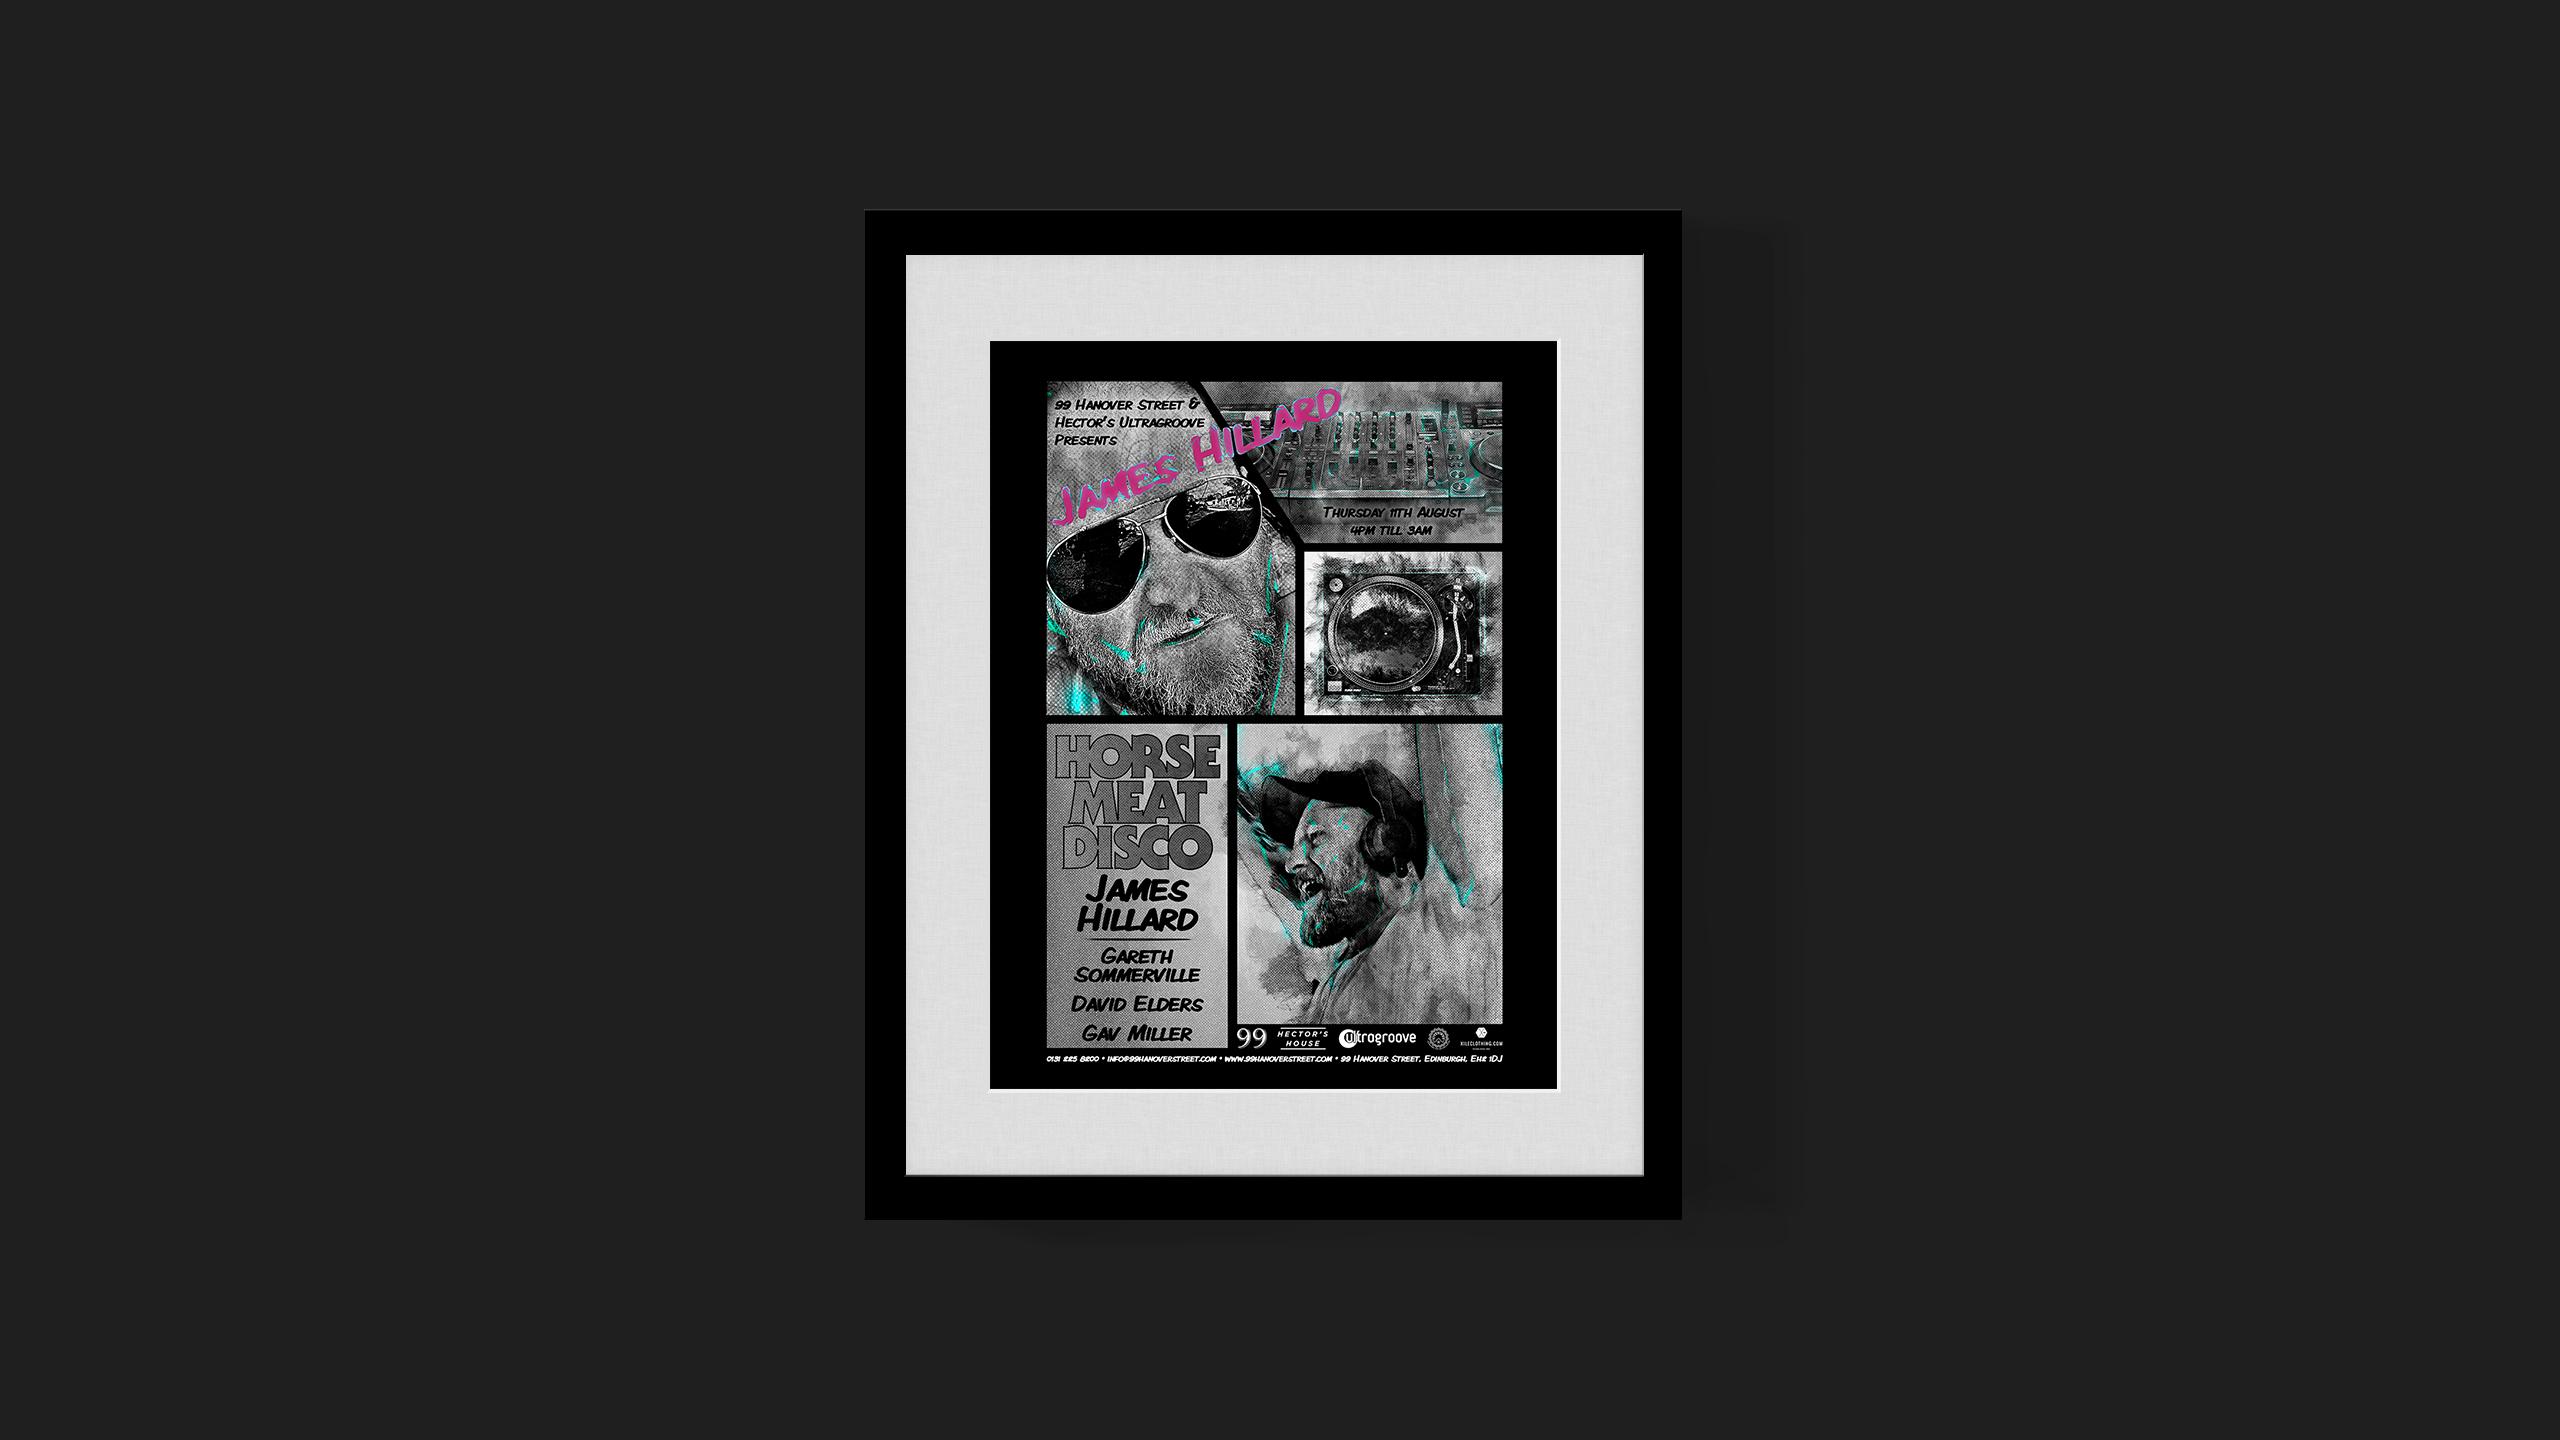 James Hillard — Horse Meat Disco poster created 99 Hanover Street, Edinburgh Fringe Festival '16